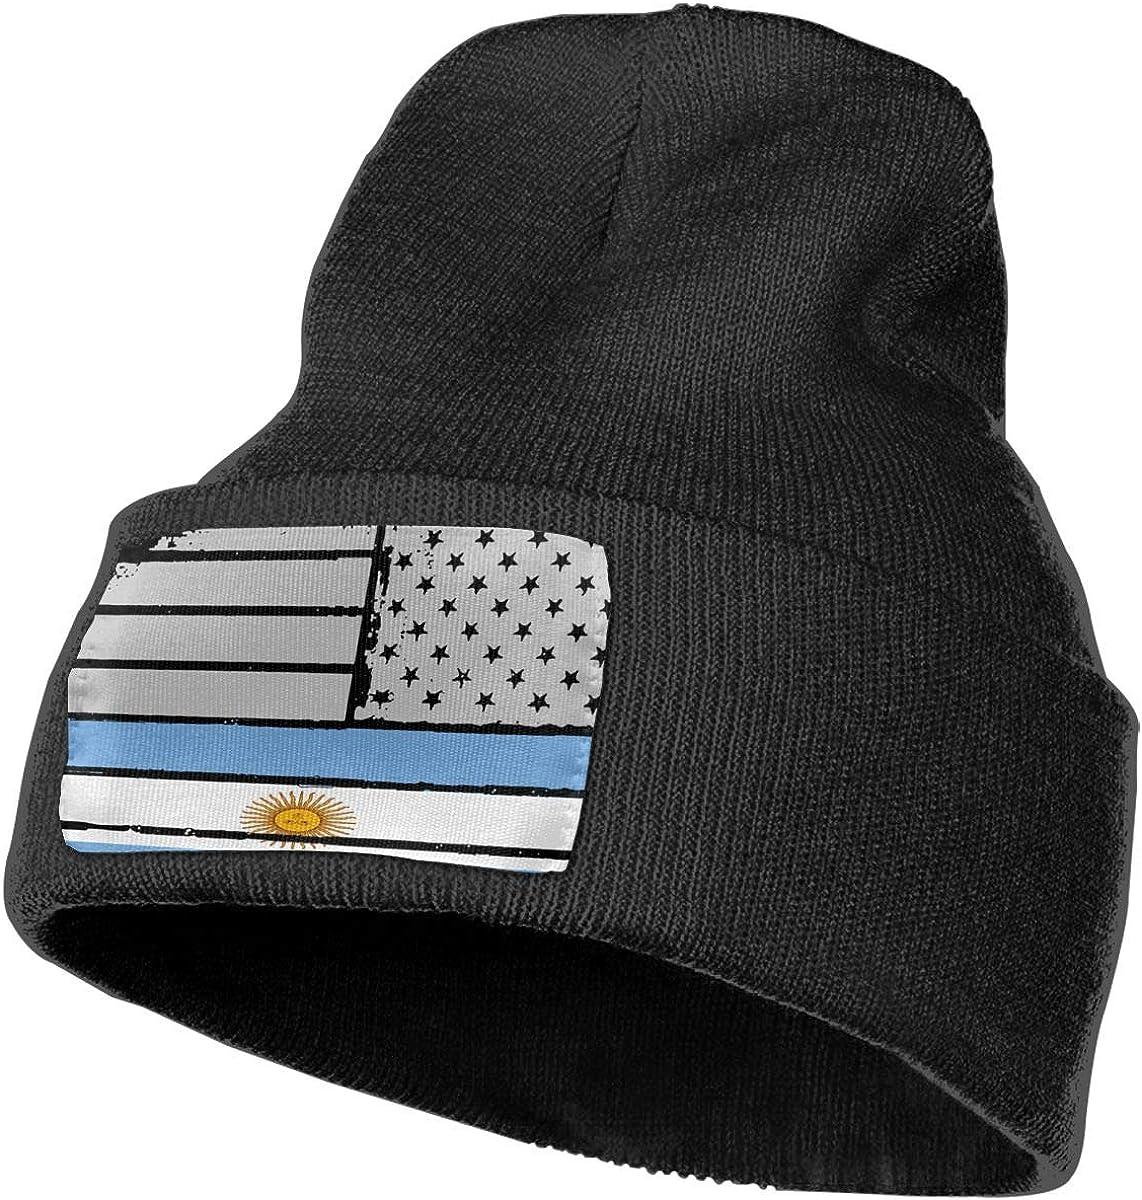 Men Women Grungy Argentina American Flag Heart Adjustable Jeans Baseball Cap Sun Hat